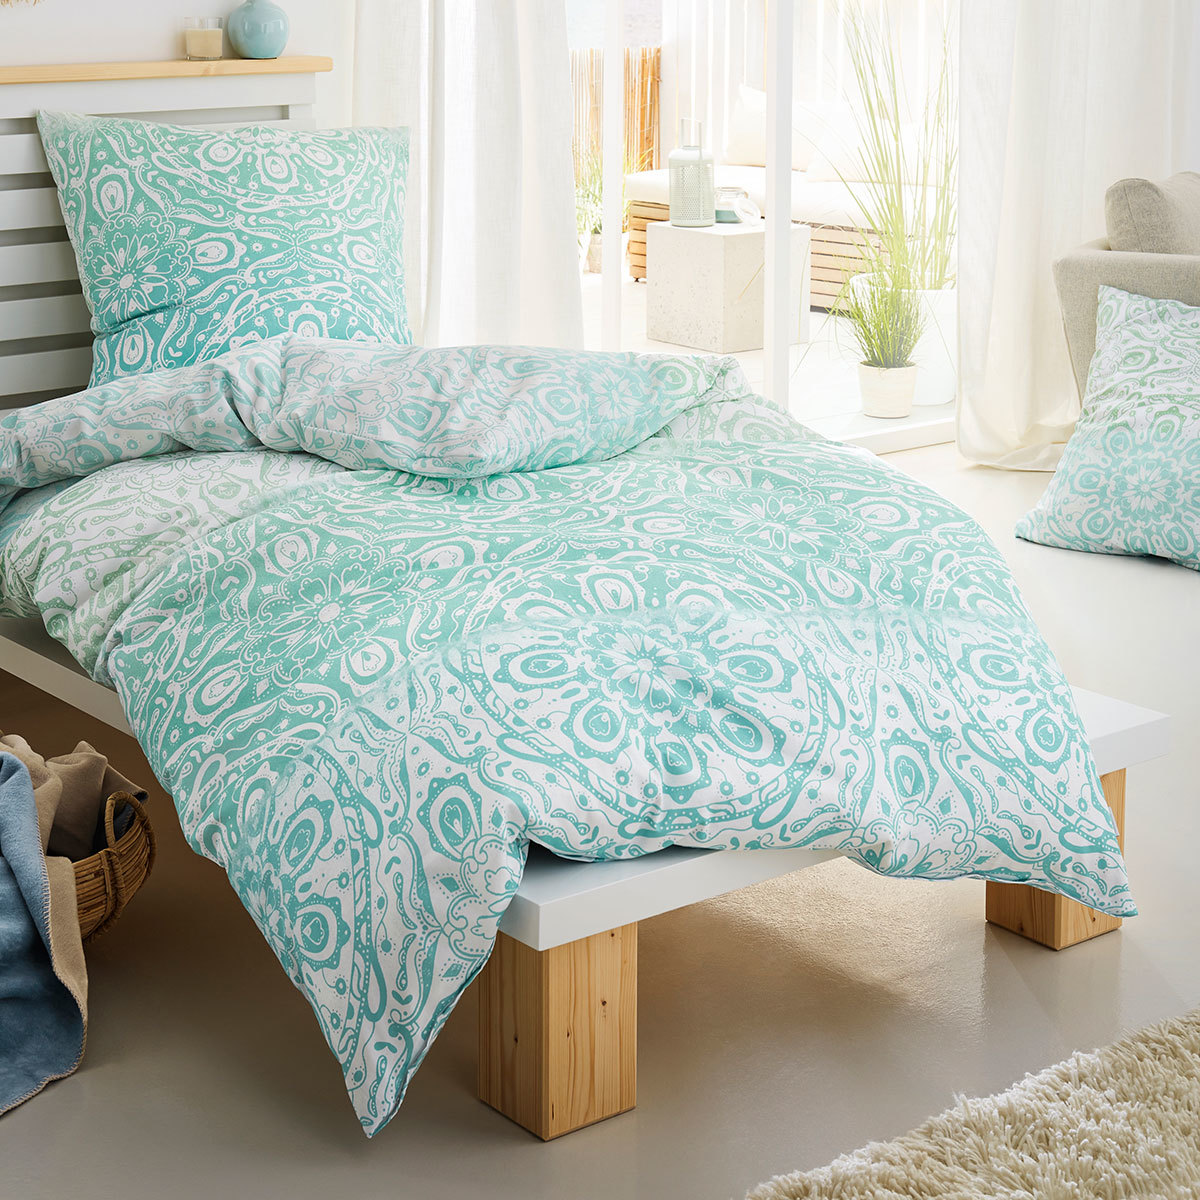 ibena mako satin bettw sche zeitgeist amersfoort g nstig. Black Bedroom Furniture Sets. Home Design Ideas